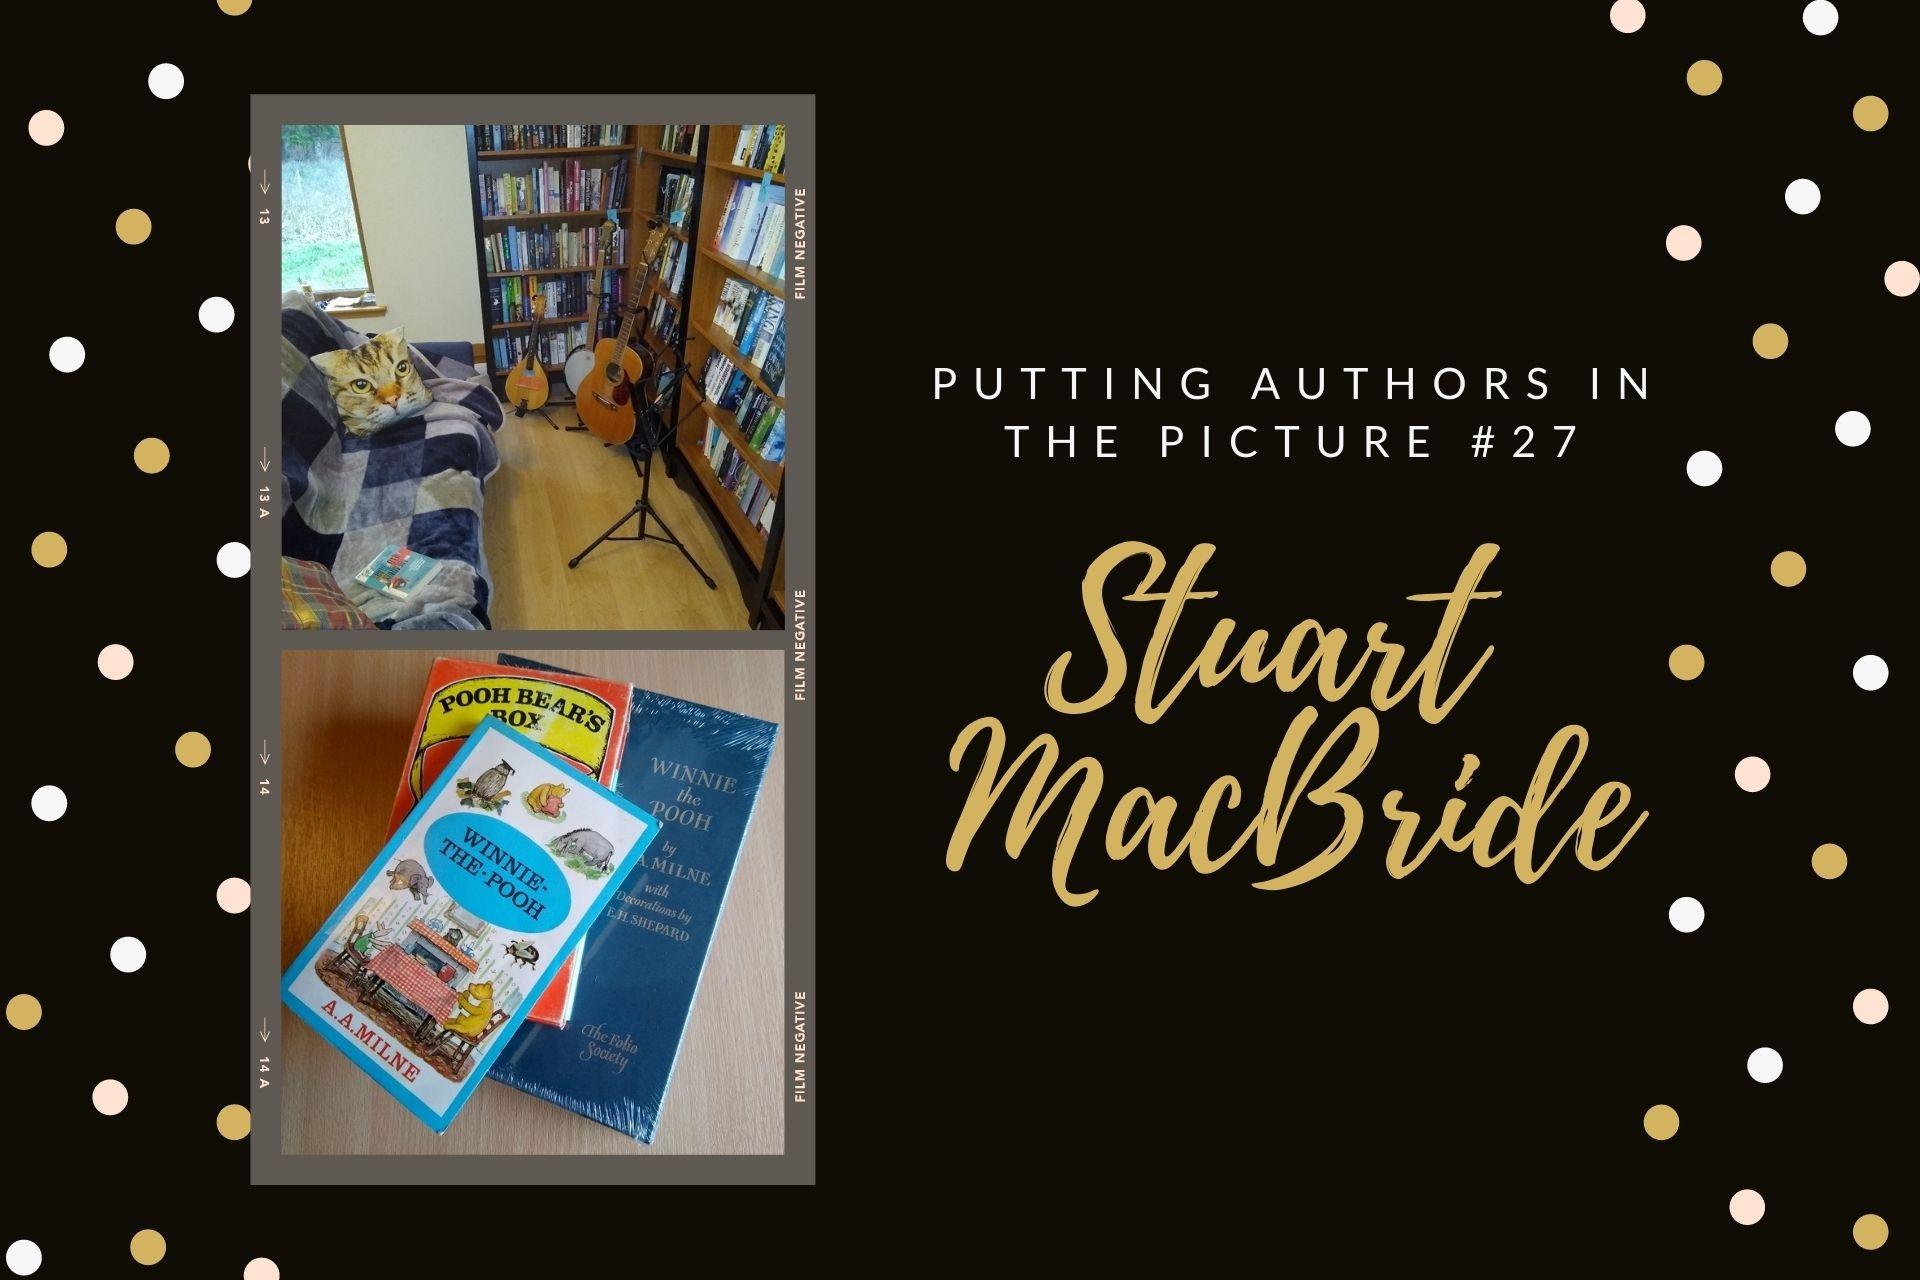 Putting Authors in the Picture #27: Stuart MacBride